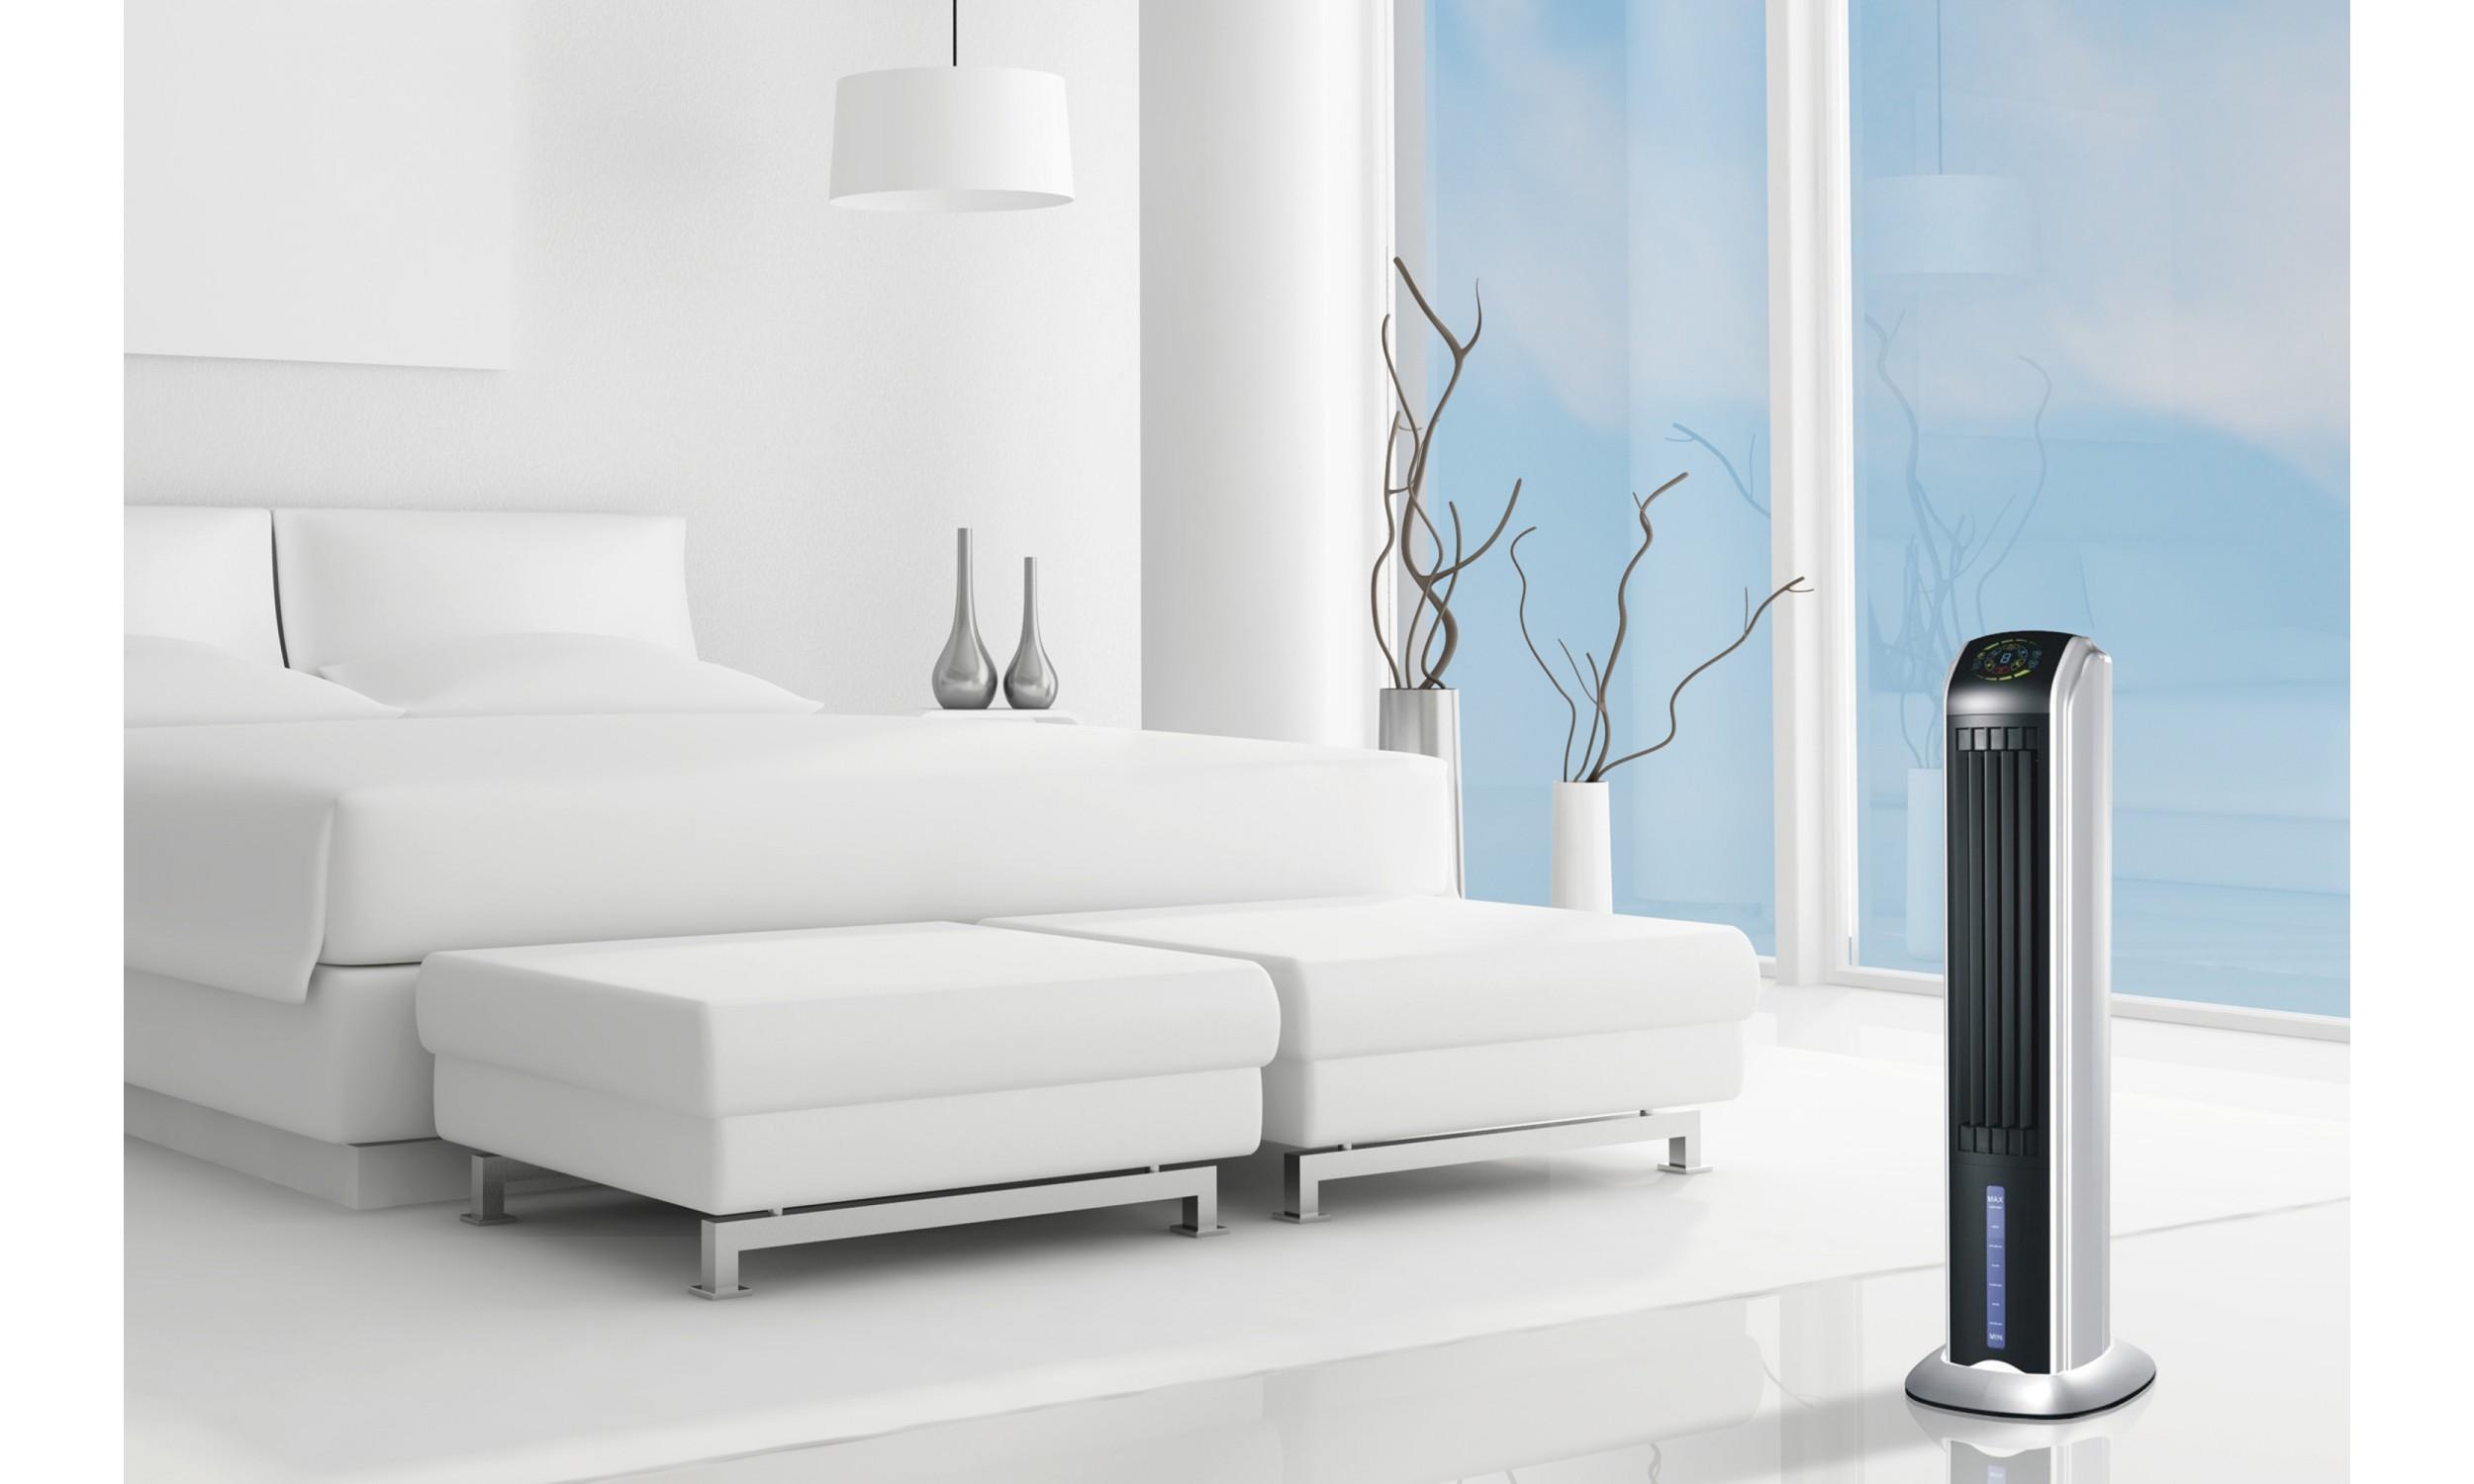 Evaporative air cooler Rafy 81